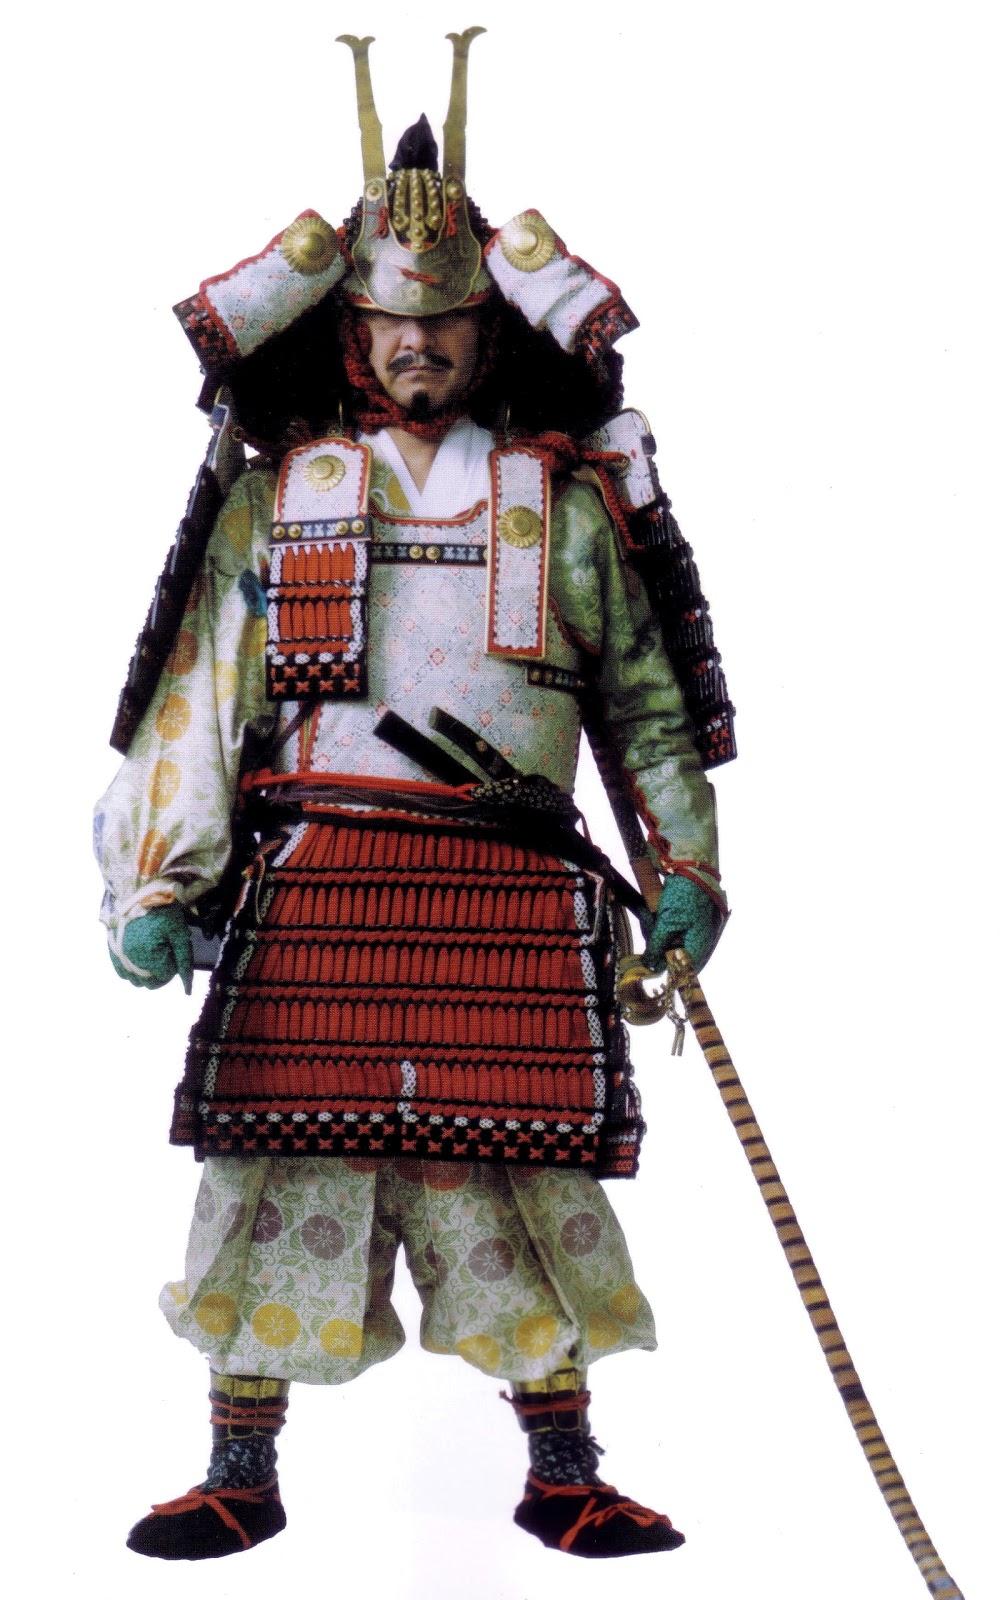 Kenshi la cultura detras del anime armaduras samurai clase ohyoroi